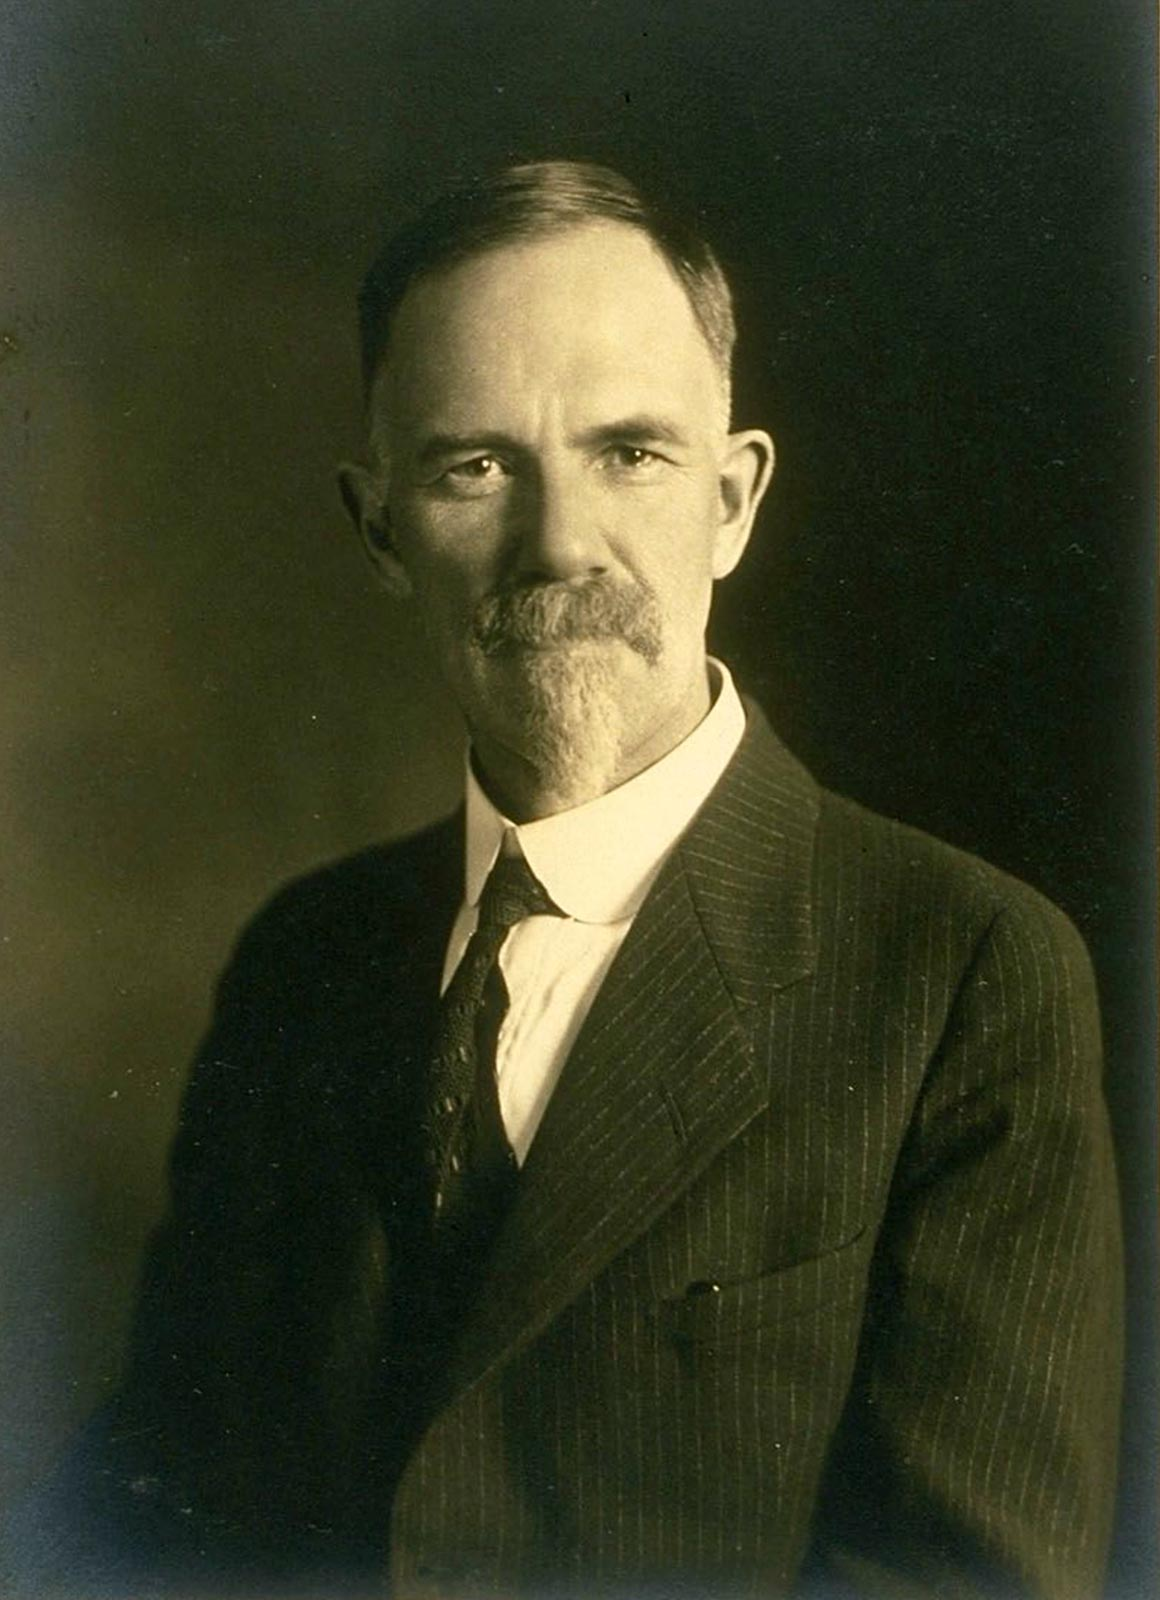 Charles Davenport 1929